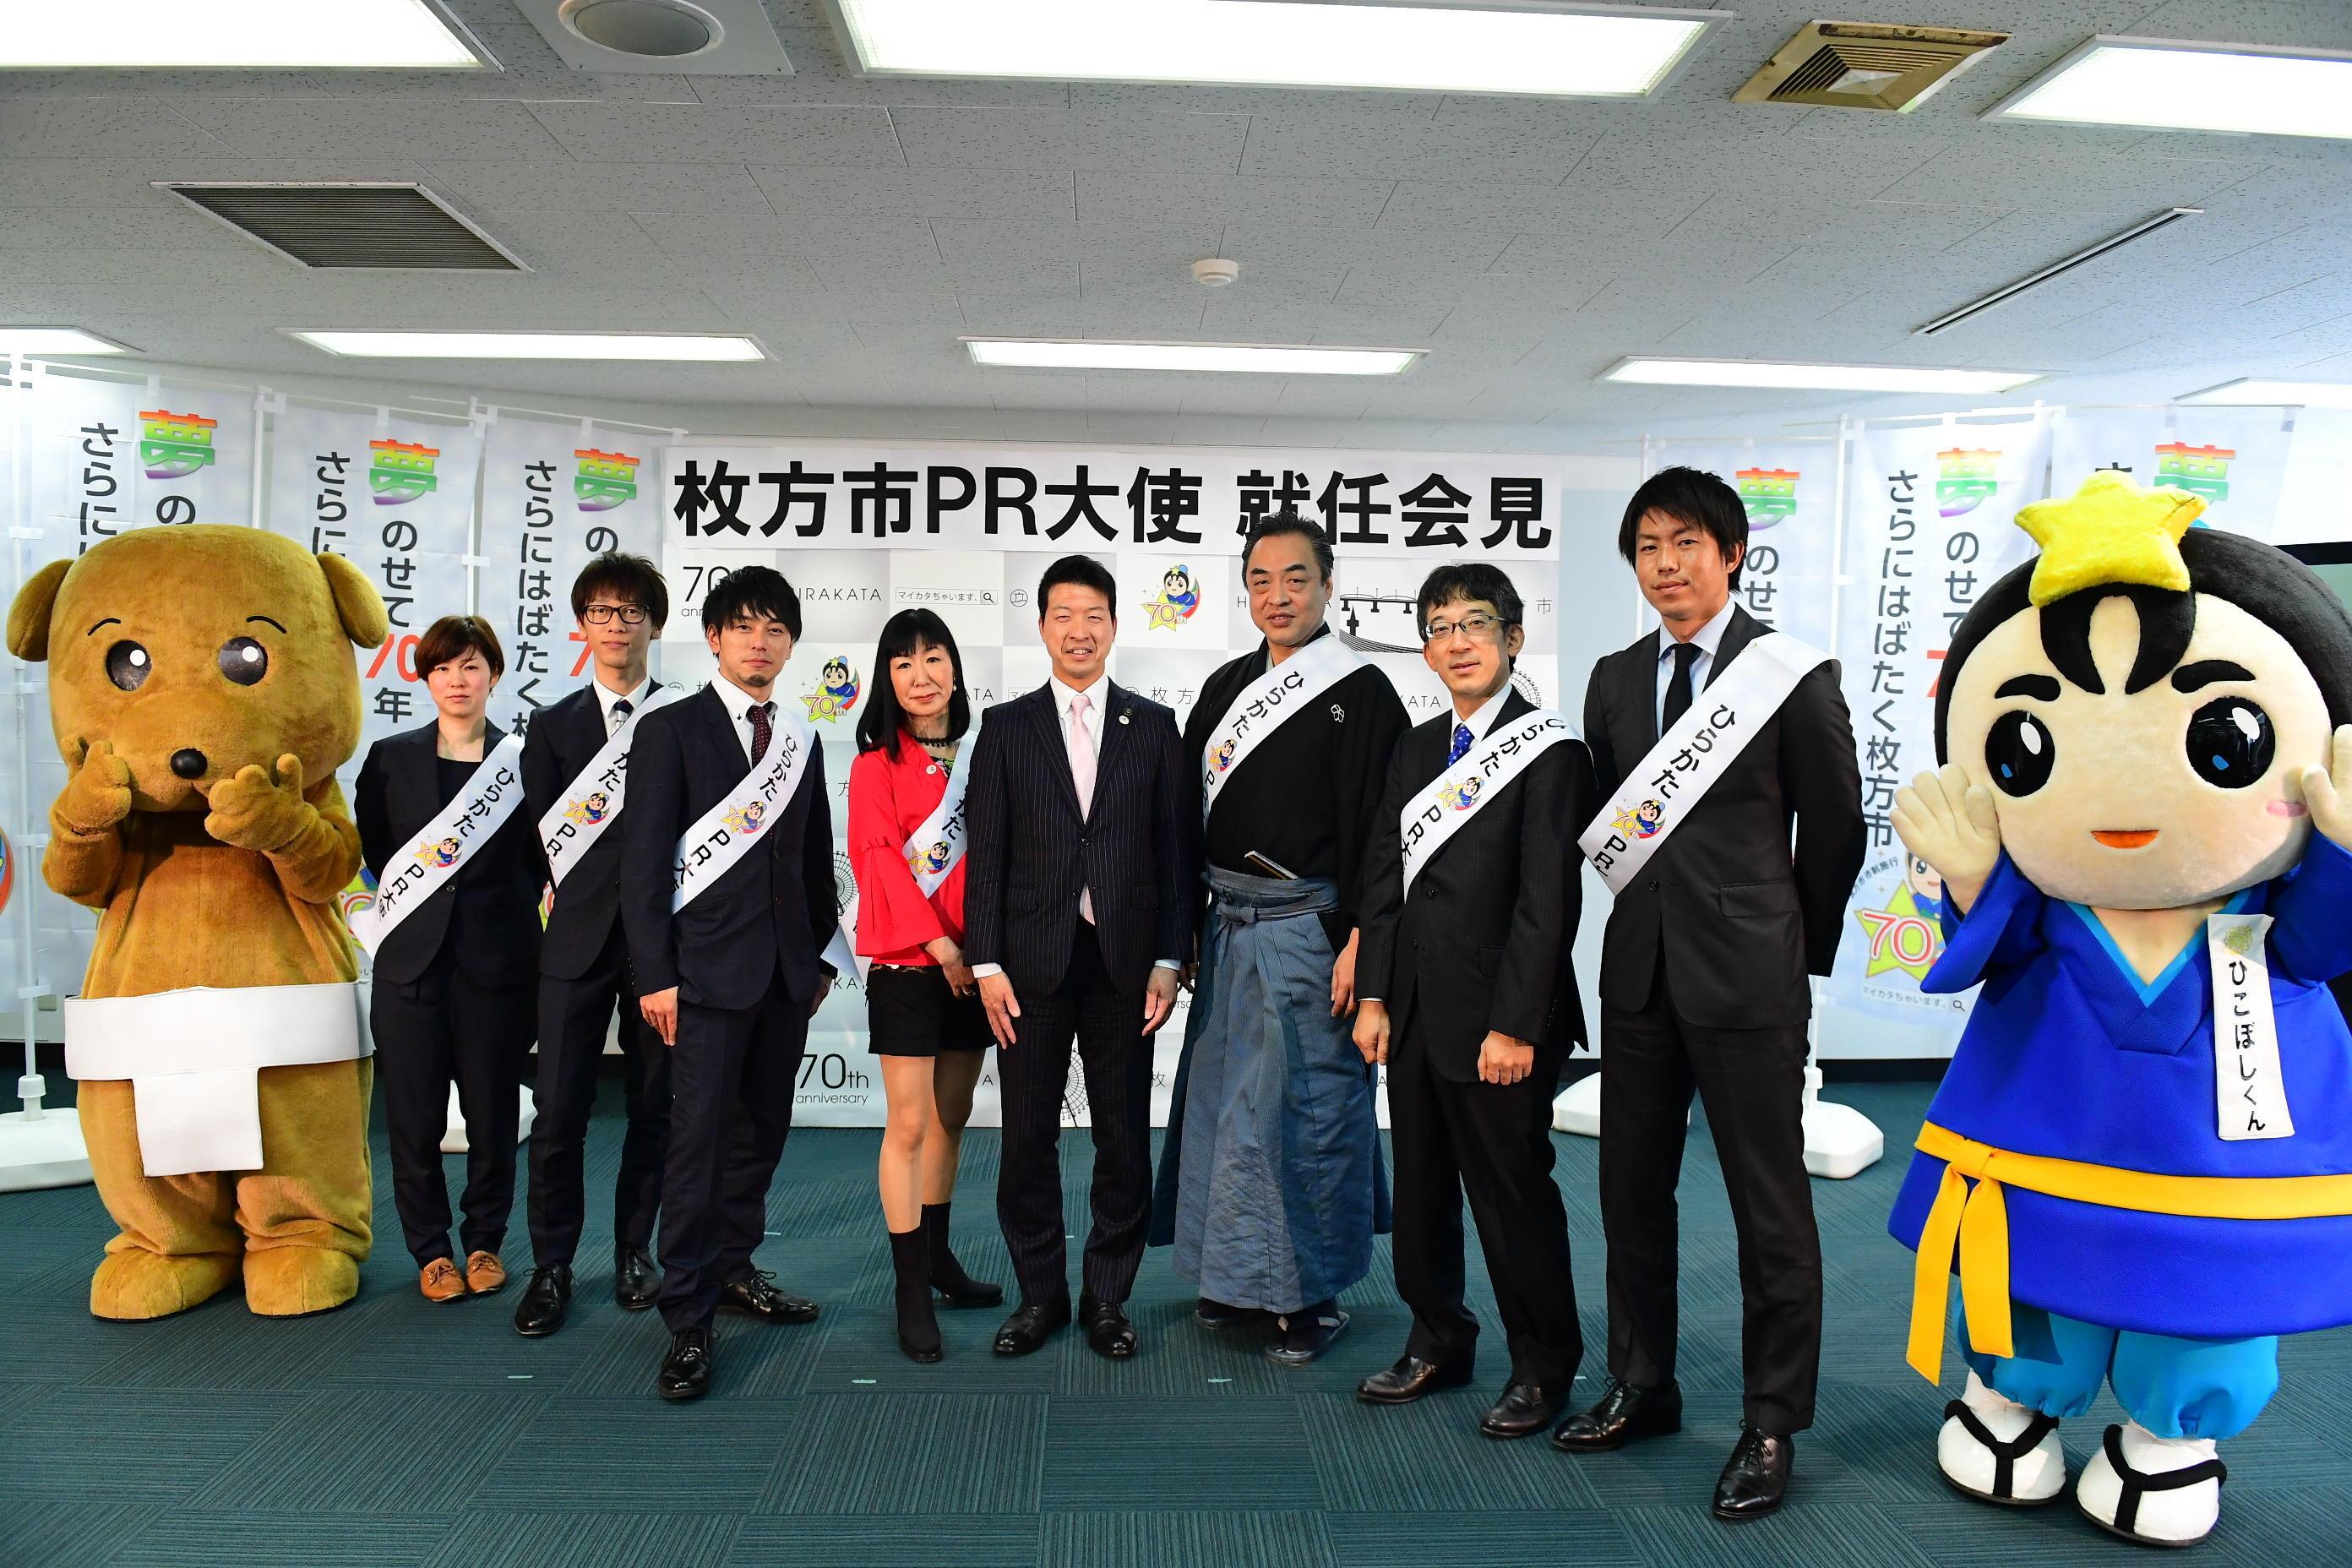 http://news.yoshimoto.co.jp/20170410172857-47a6129dd824273783373b97a90938bb5d8c2c50.jpg